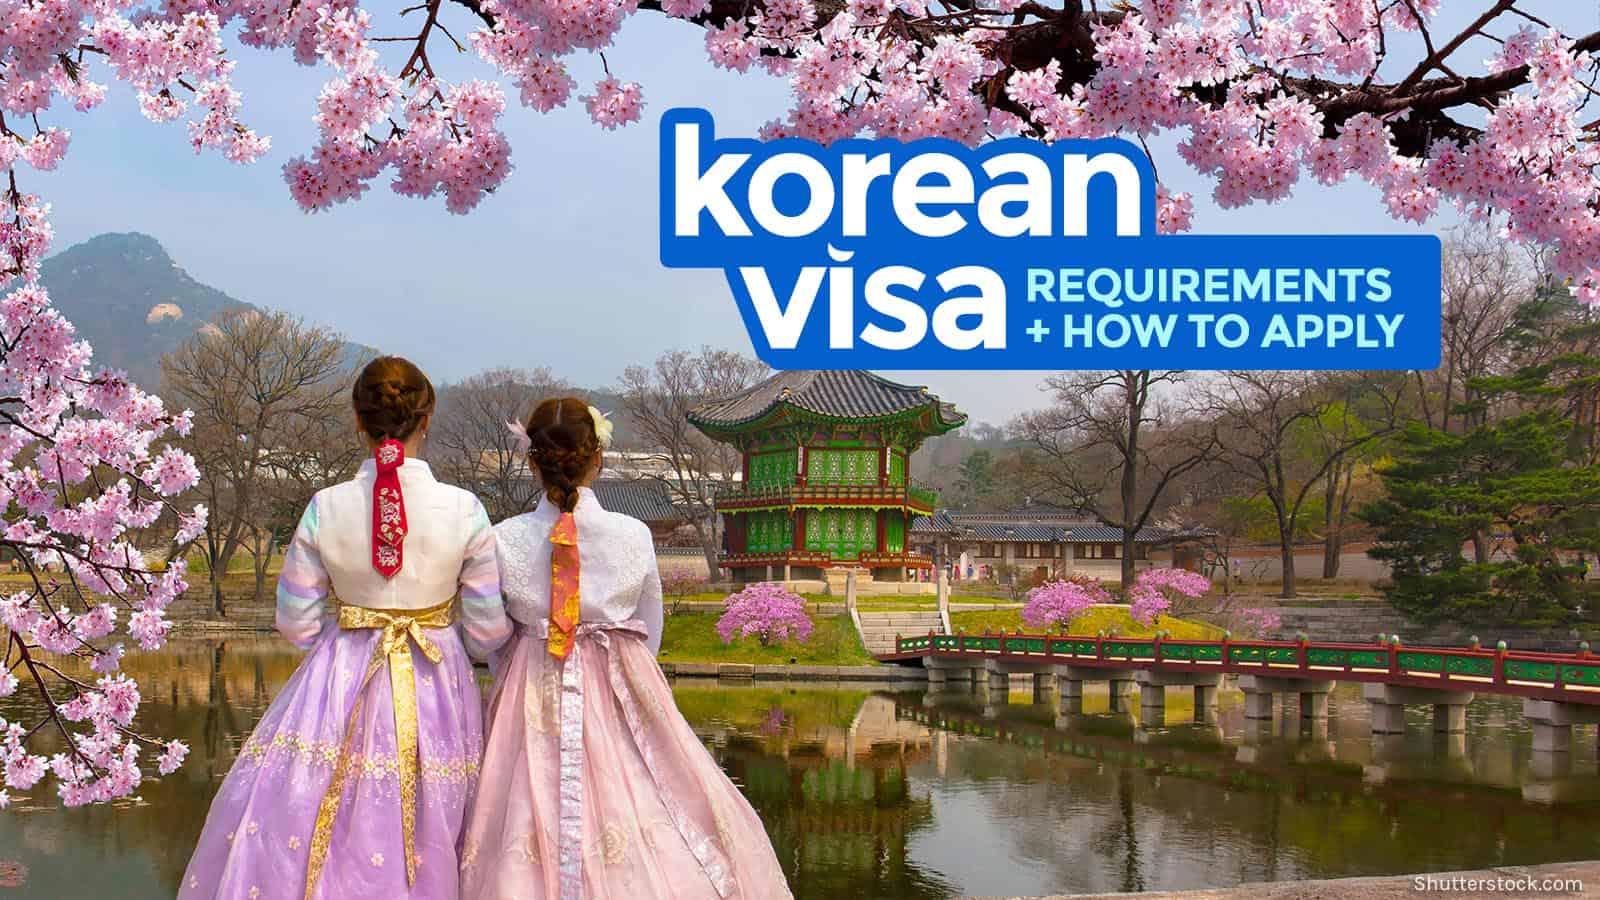 NEW KOREAN VISA APPLICATION PROCESS & REQUIREMENTS 2018